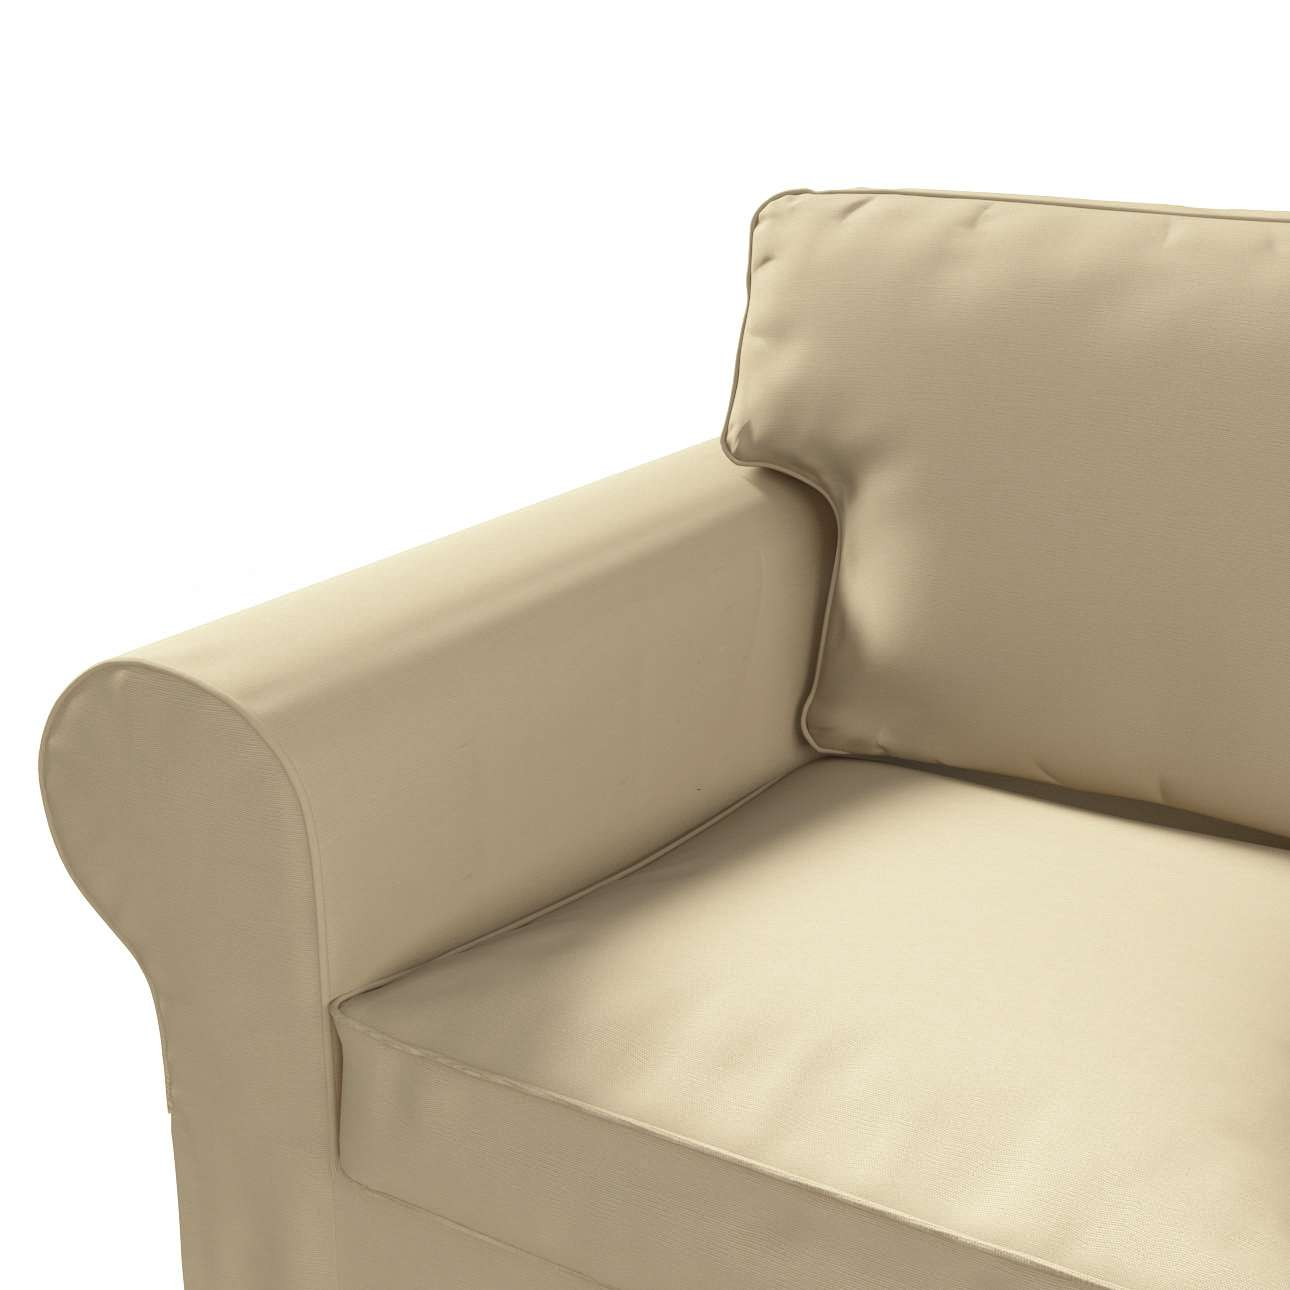 Ektorp 2 sæder sovesofa gammel model<br/>Bredde ca 195cm Betræk uden sofa fra kollektionen Cotton Panama, Stof: 702-01